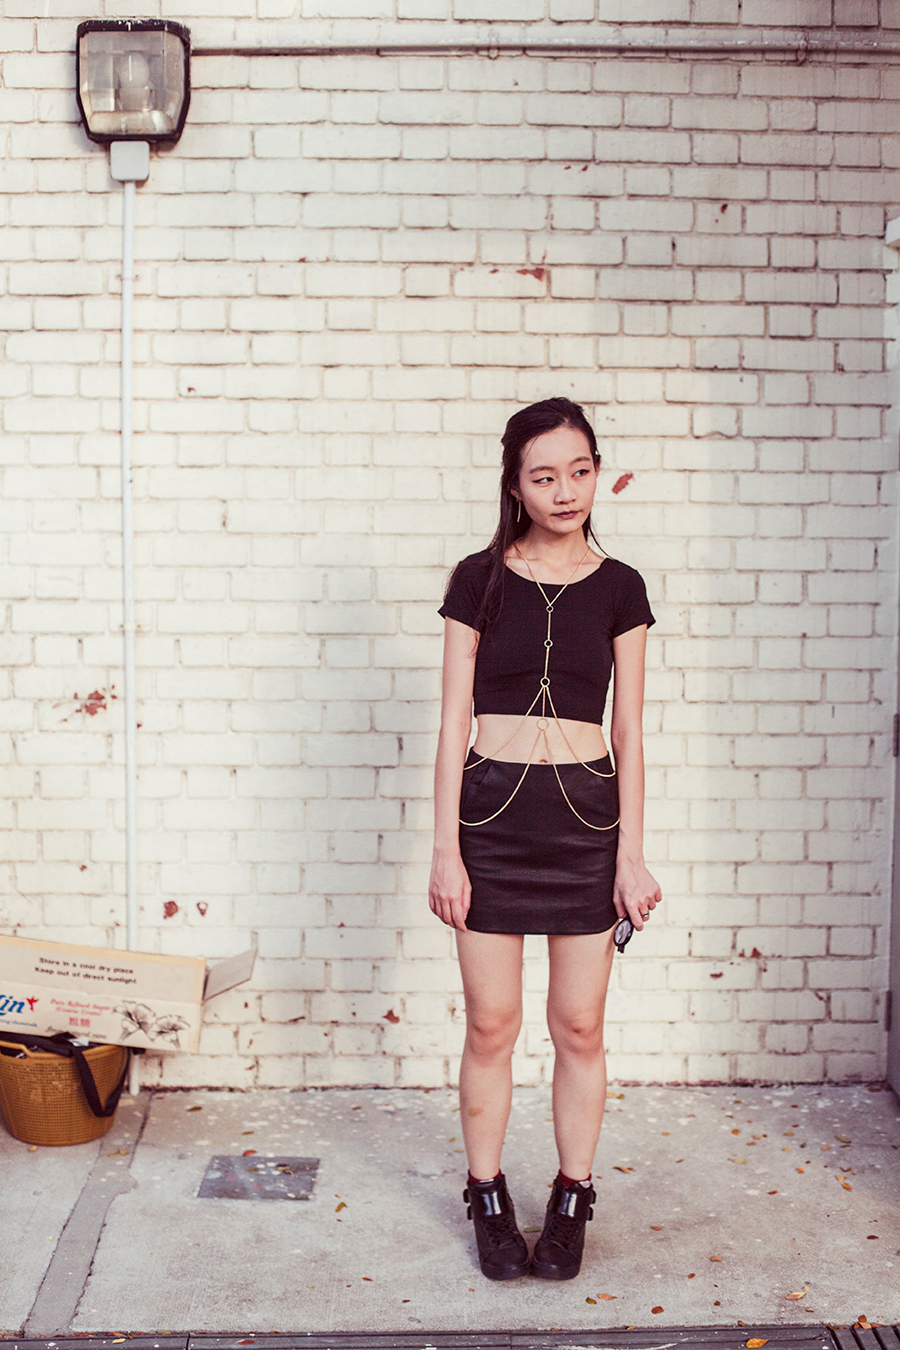 Dresslink black crop top, Topshop black mini skirt, Topshop gold bodychain, Zalora PU black high top sneakers.